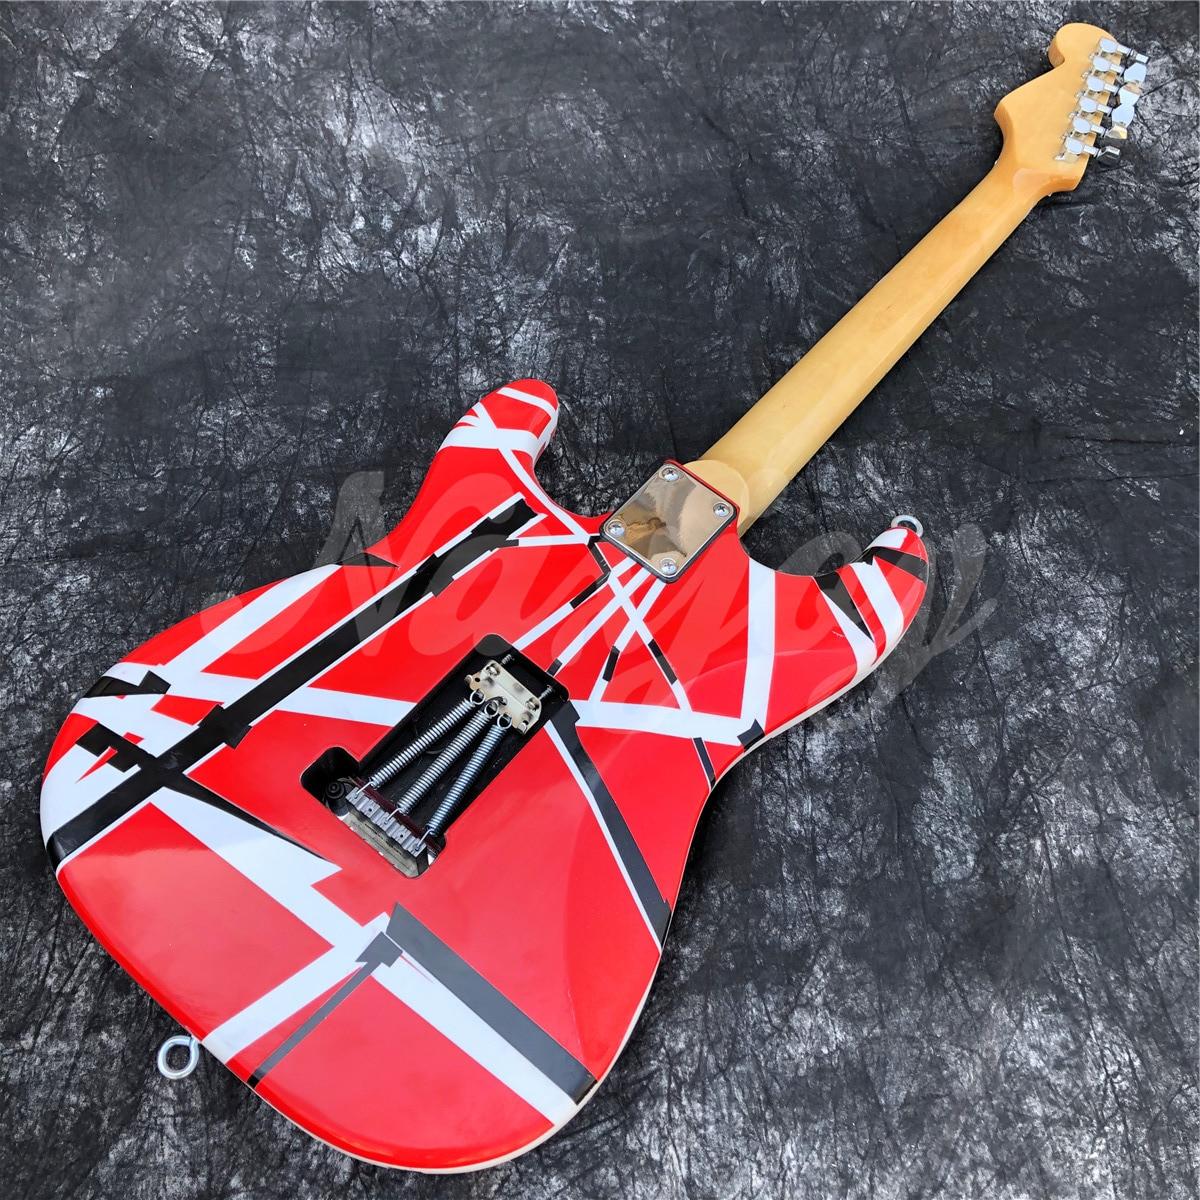 2021 New Eddie Van Halen TRIBUTE,Electric Guitar Frankenstein, Frankenstrat Quality Musical Instruments. enlarge